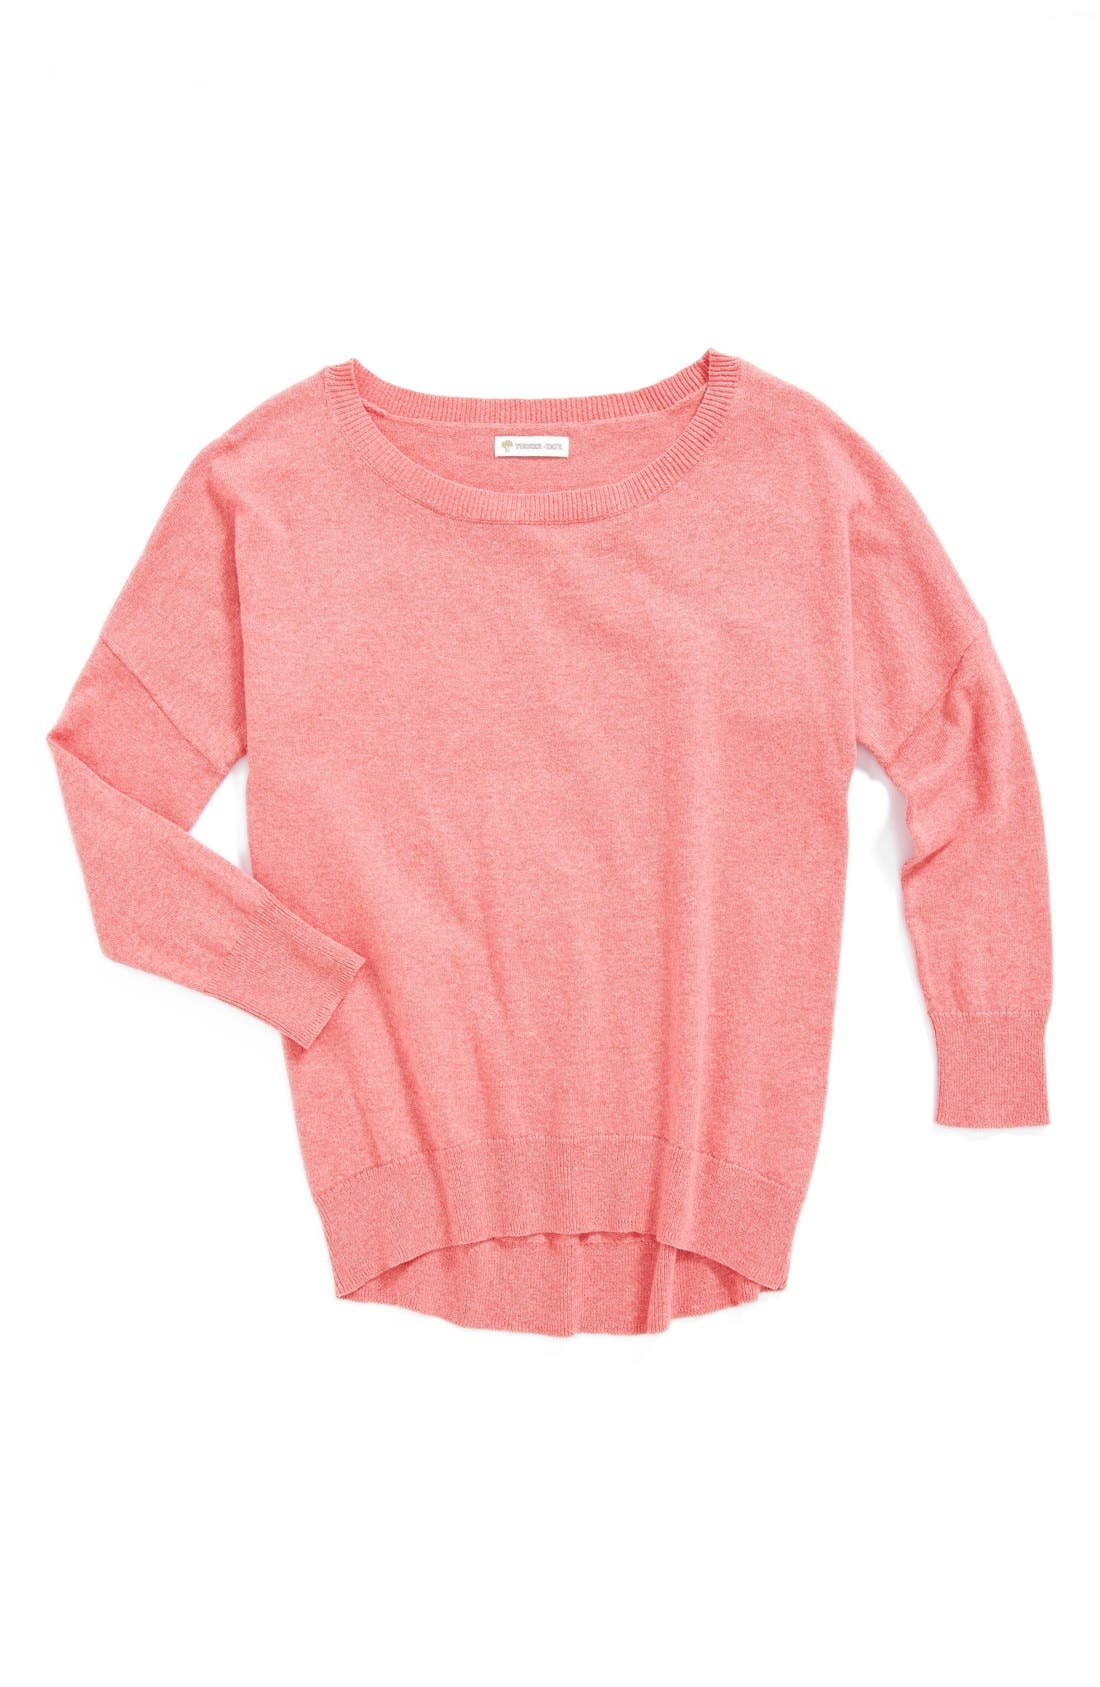 Main Image - Tucker + Tate High Low Cotton & Cashmere Sweater (Little Girls & Big Girls)